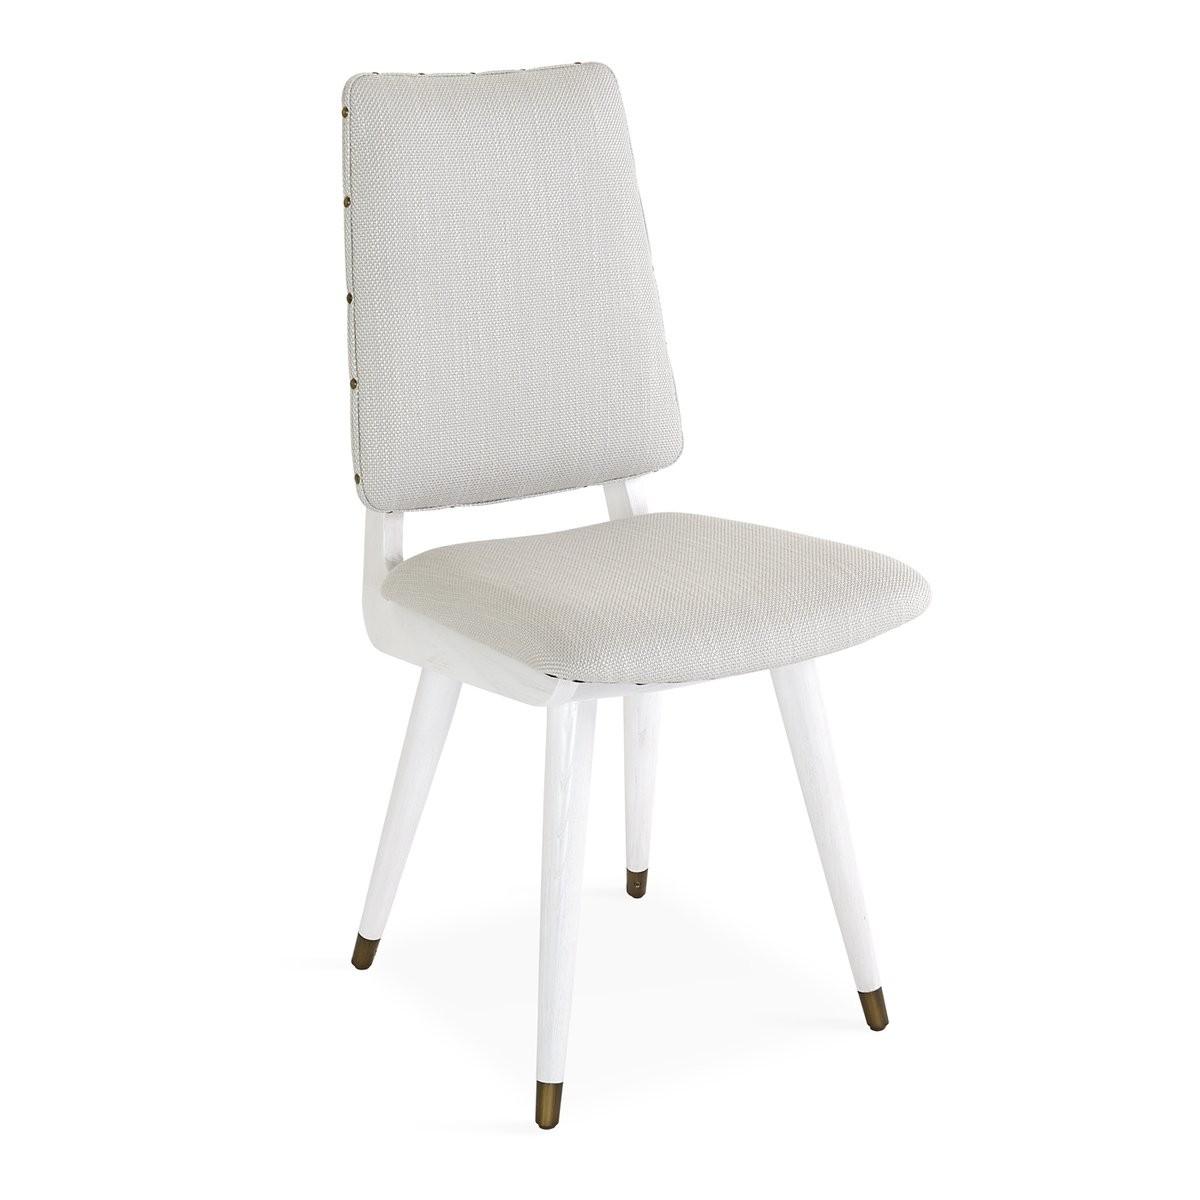 Jonathan Adler I Camille Dining Chair I Lucerne Grey